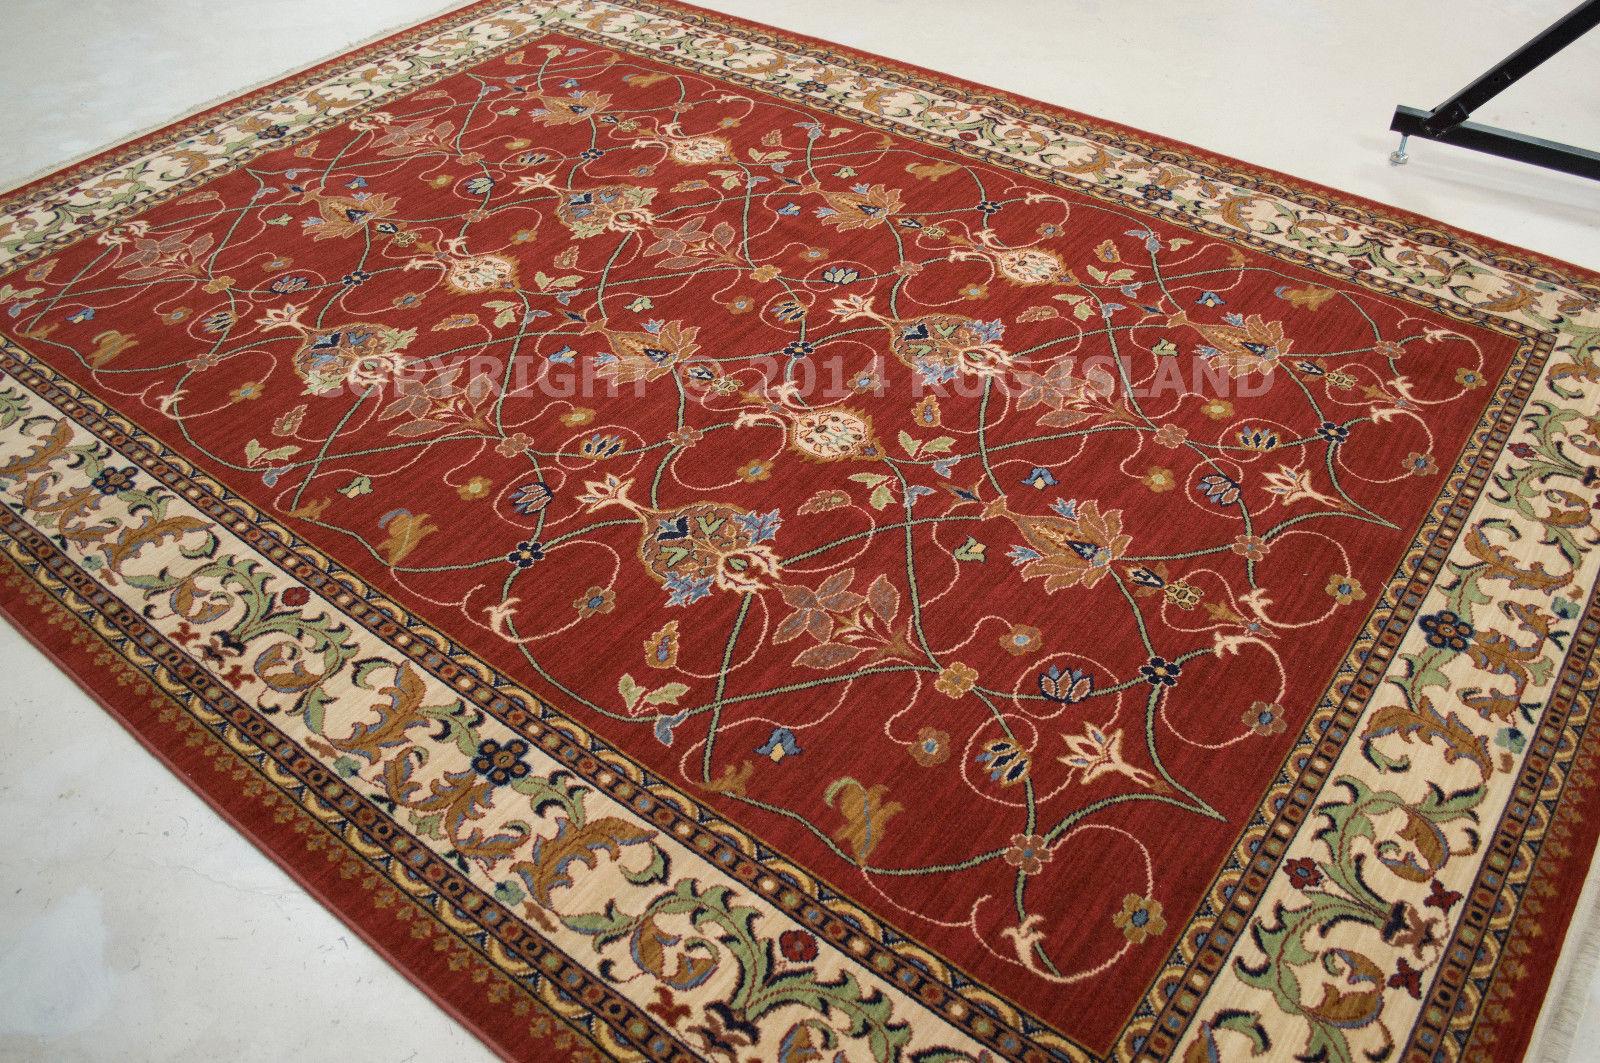 4x5 Karastan English Manor 2120 William Morris 00510 Red Wool Area Rug